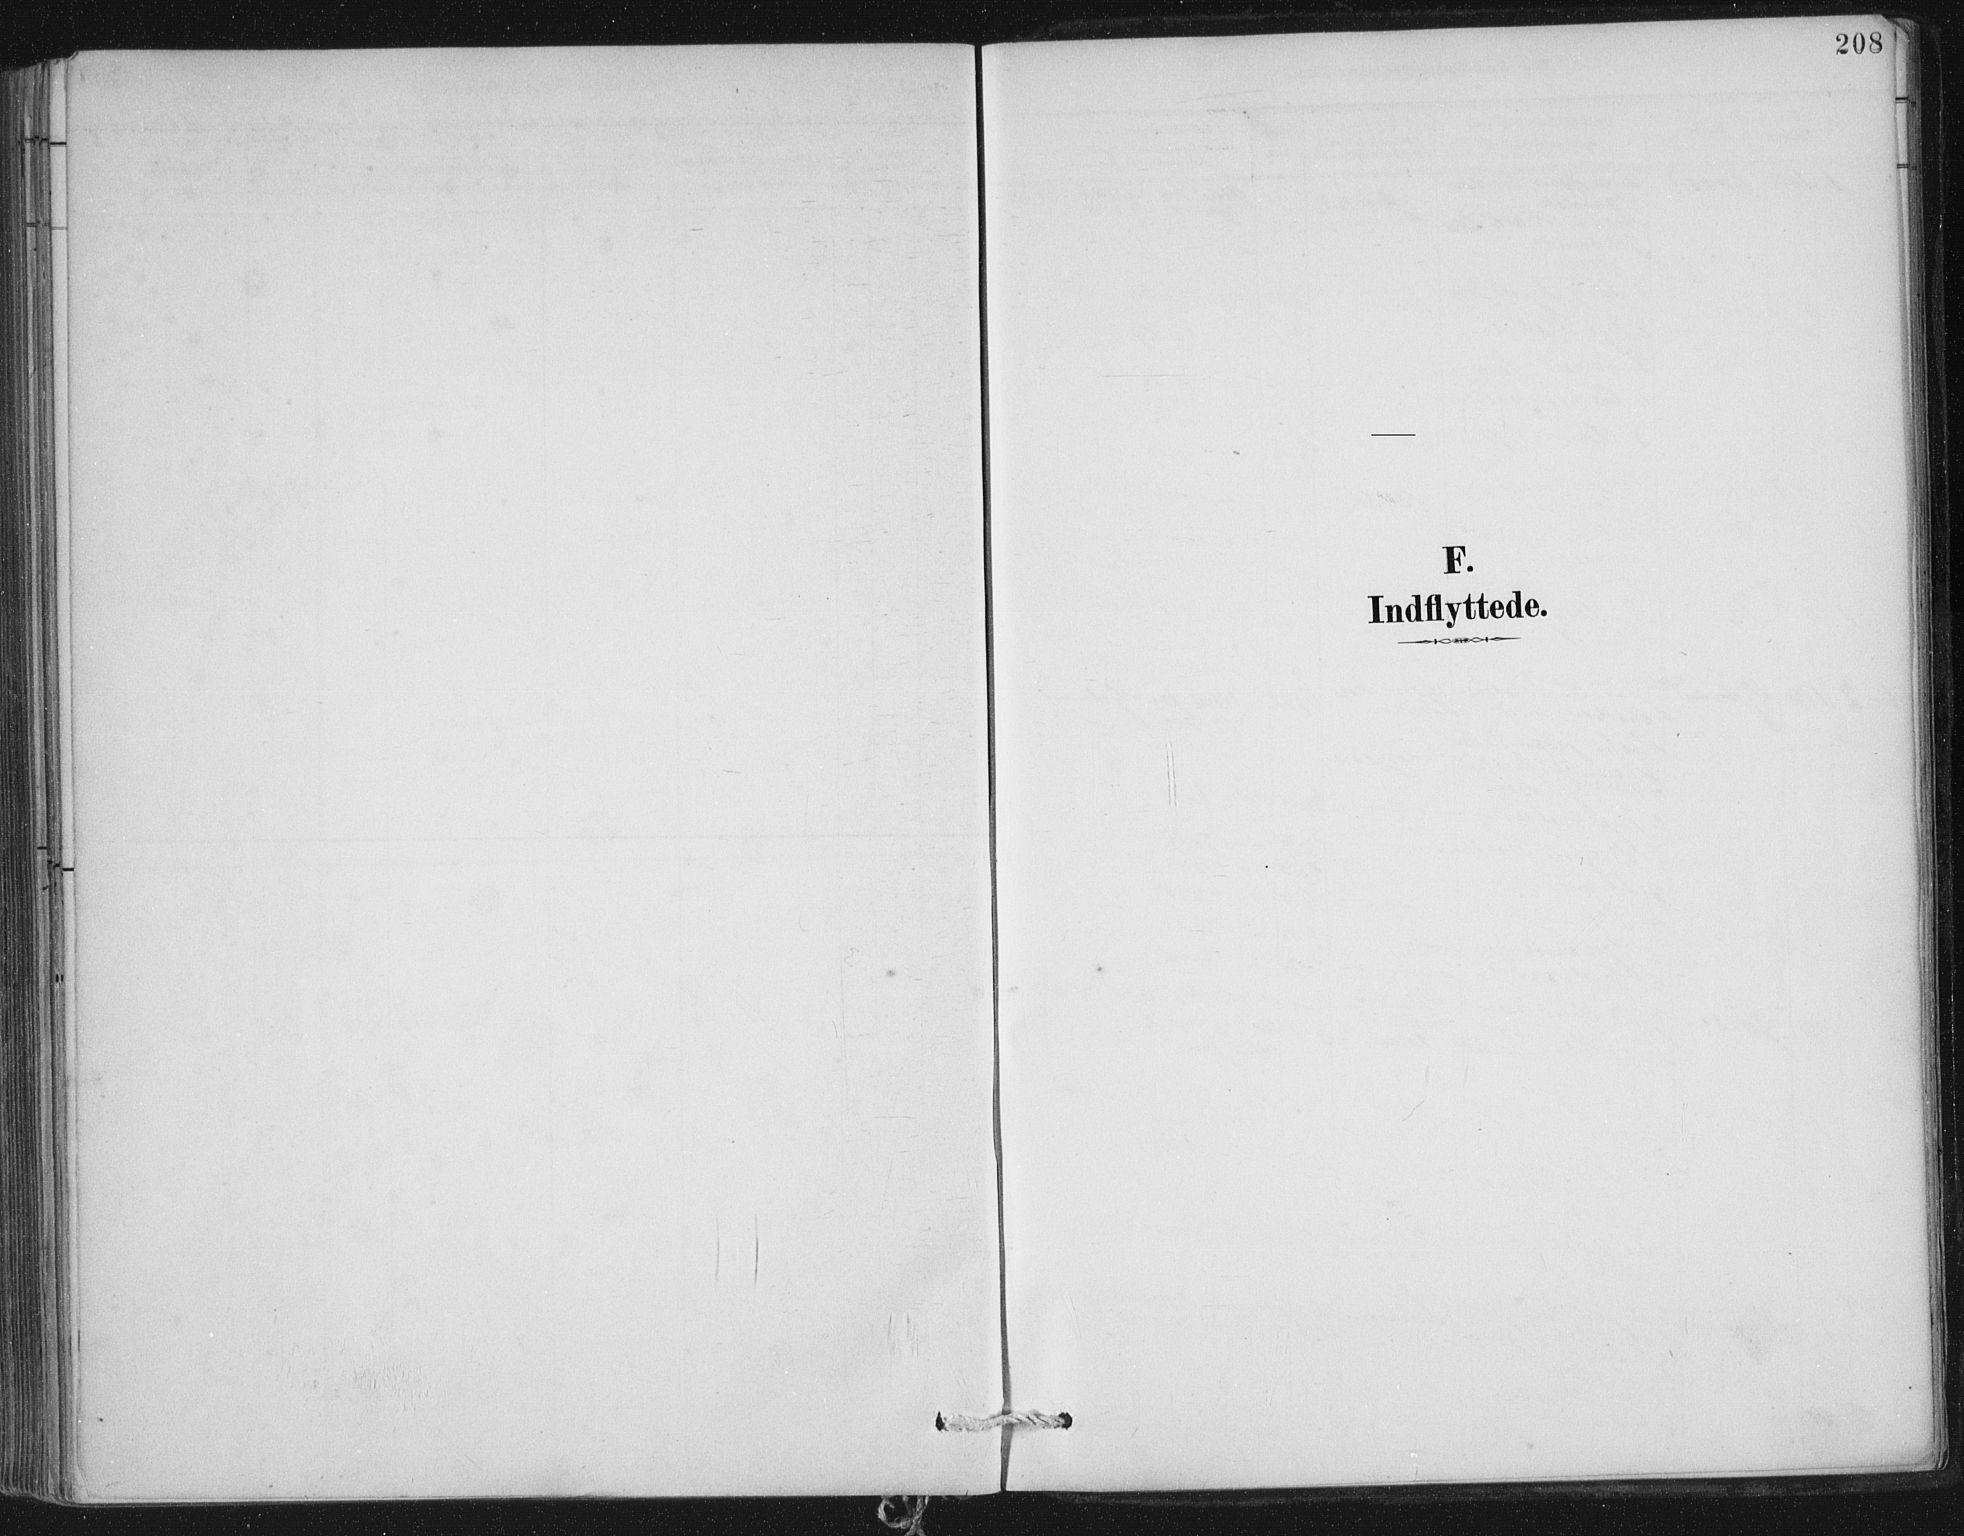 SAST, Nedstrand sokneprestkontor, IV: Ministerialbok nr. A 12, 1887-1915, s. 208